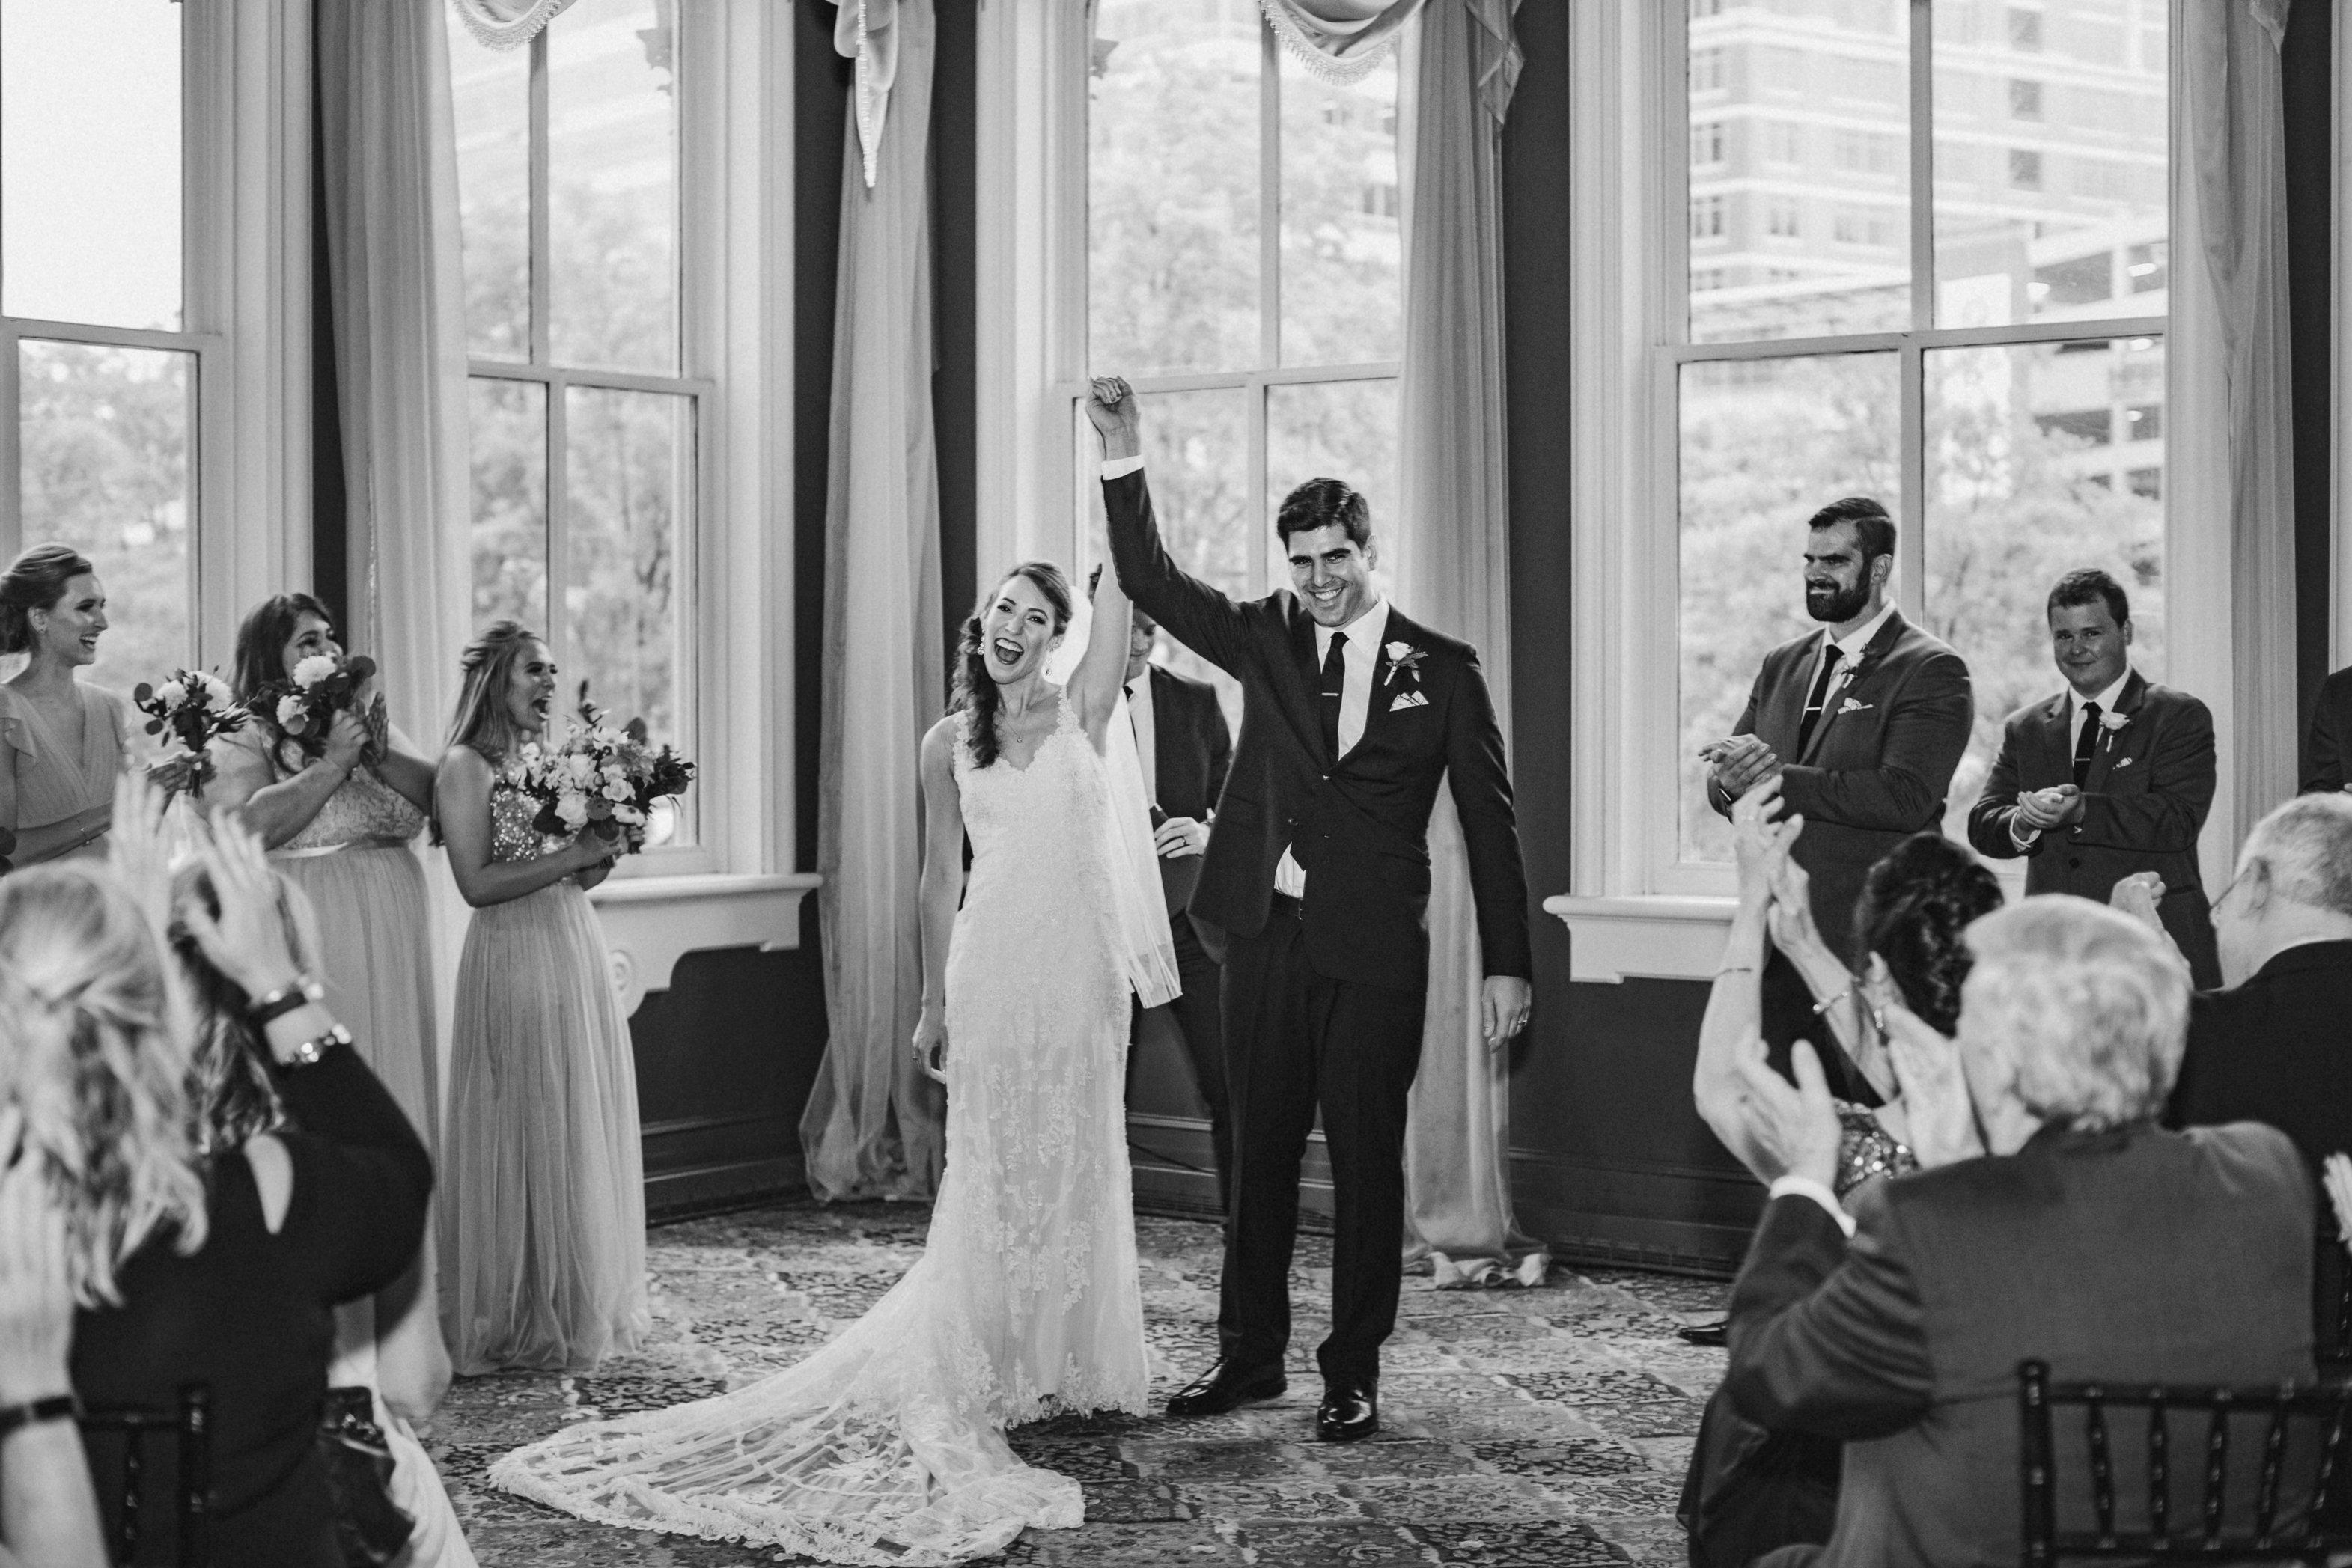 1840s Ballroom wedding ceremony Baltimore Maryland wedding photographer